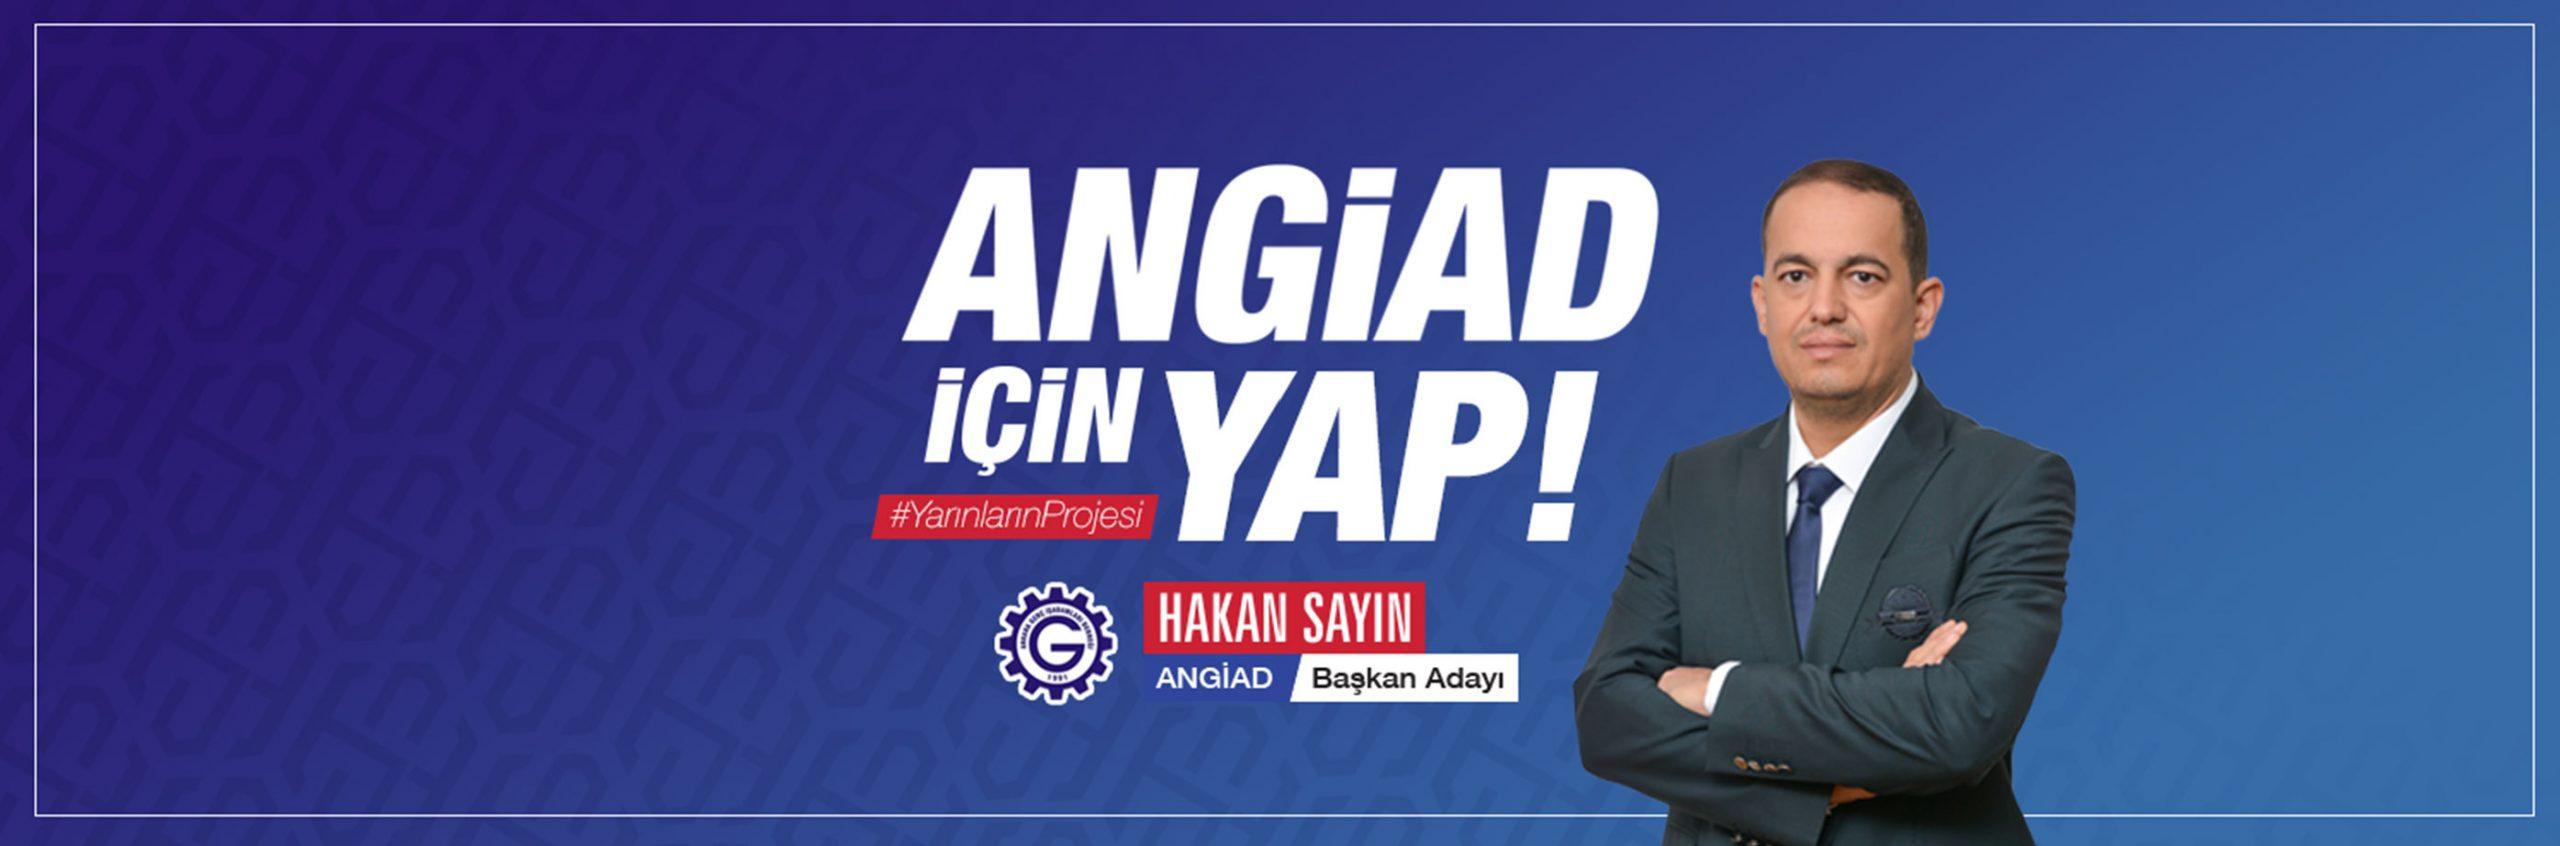 angiad hakan sayın reklam